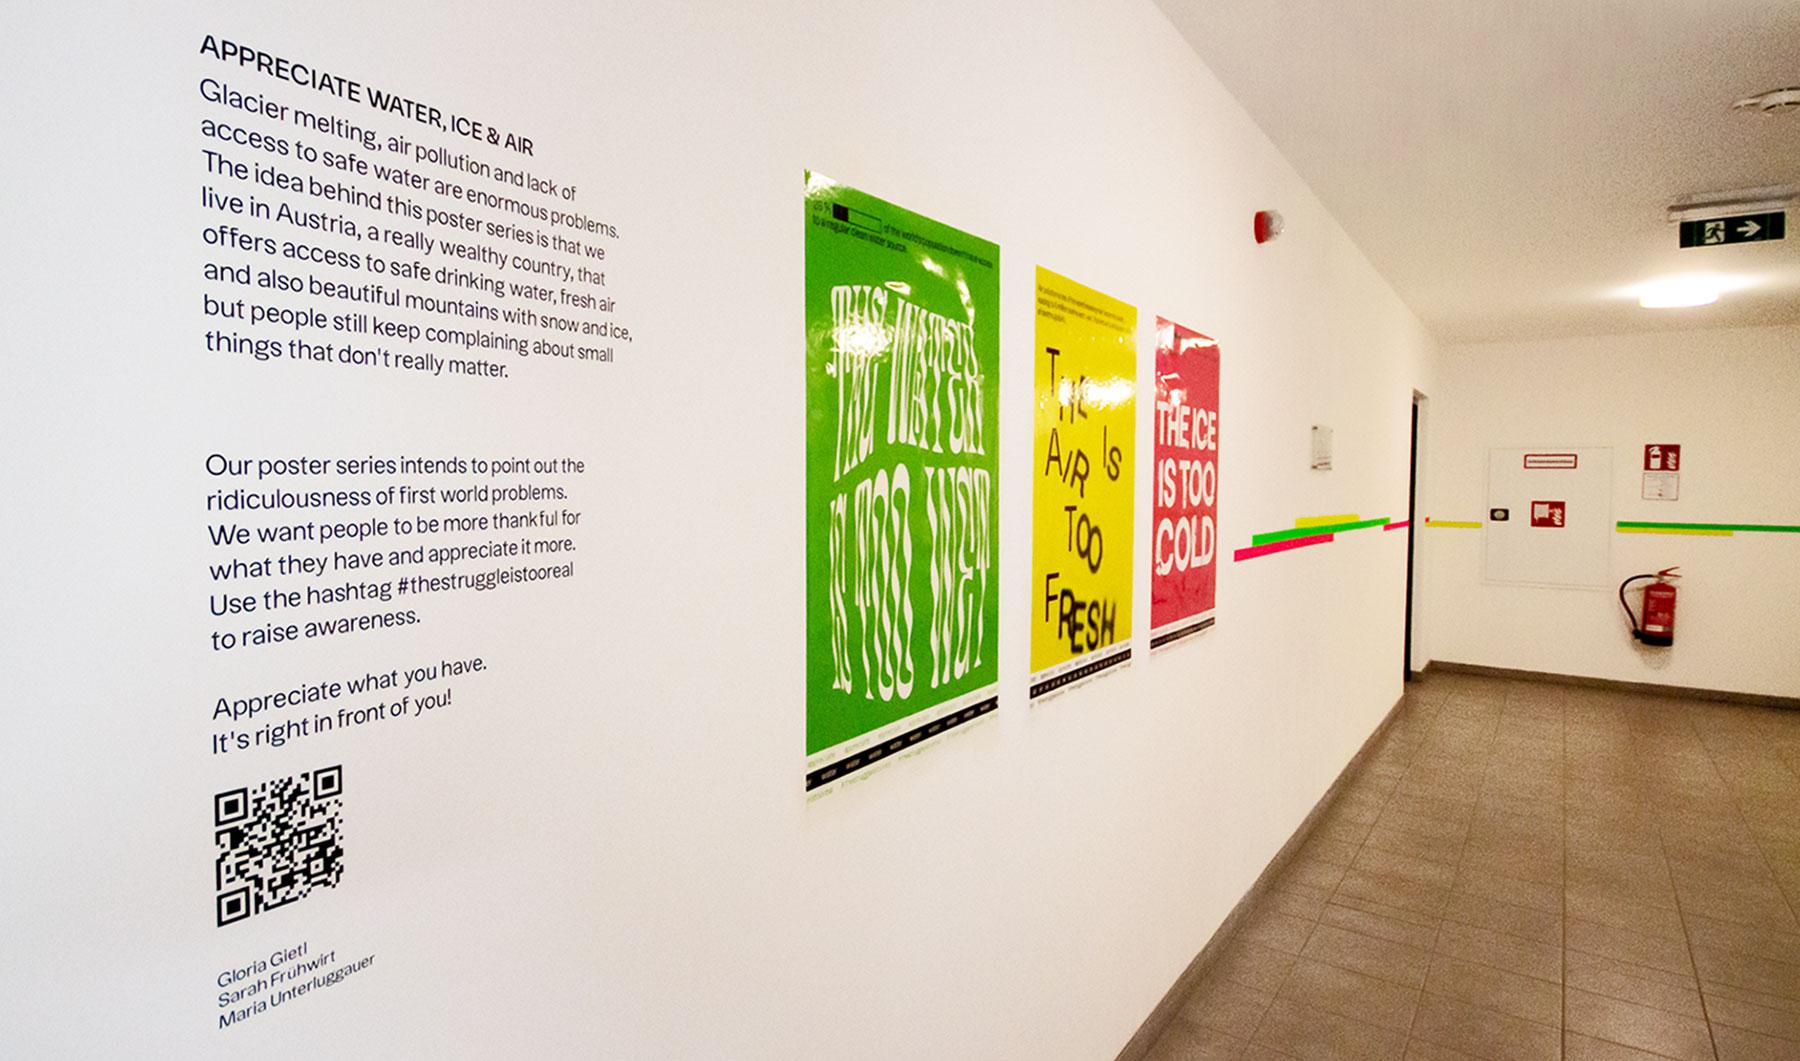 exhibition design at urban art festival by Gloria Gietl